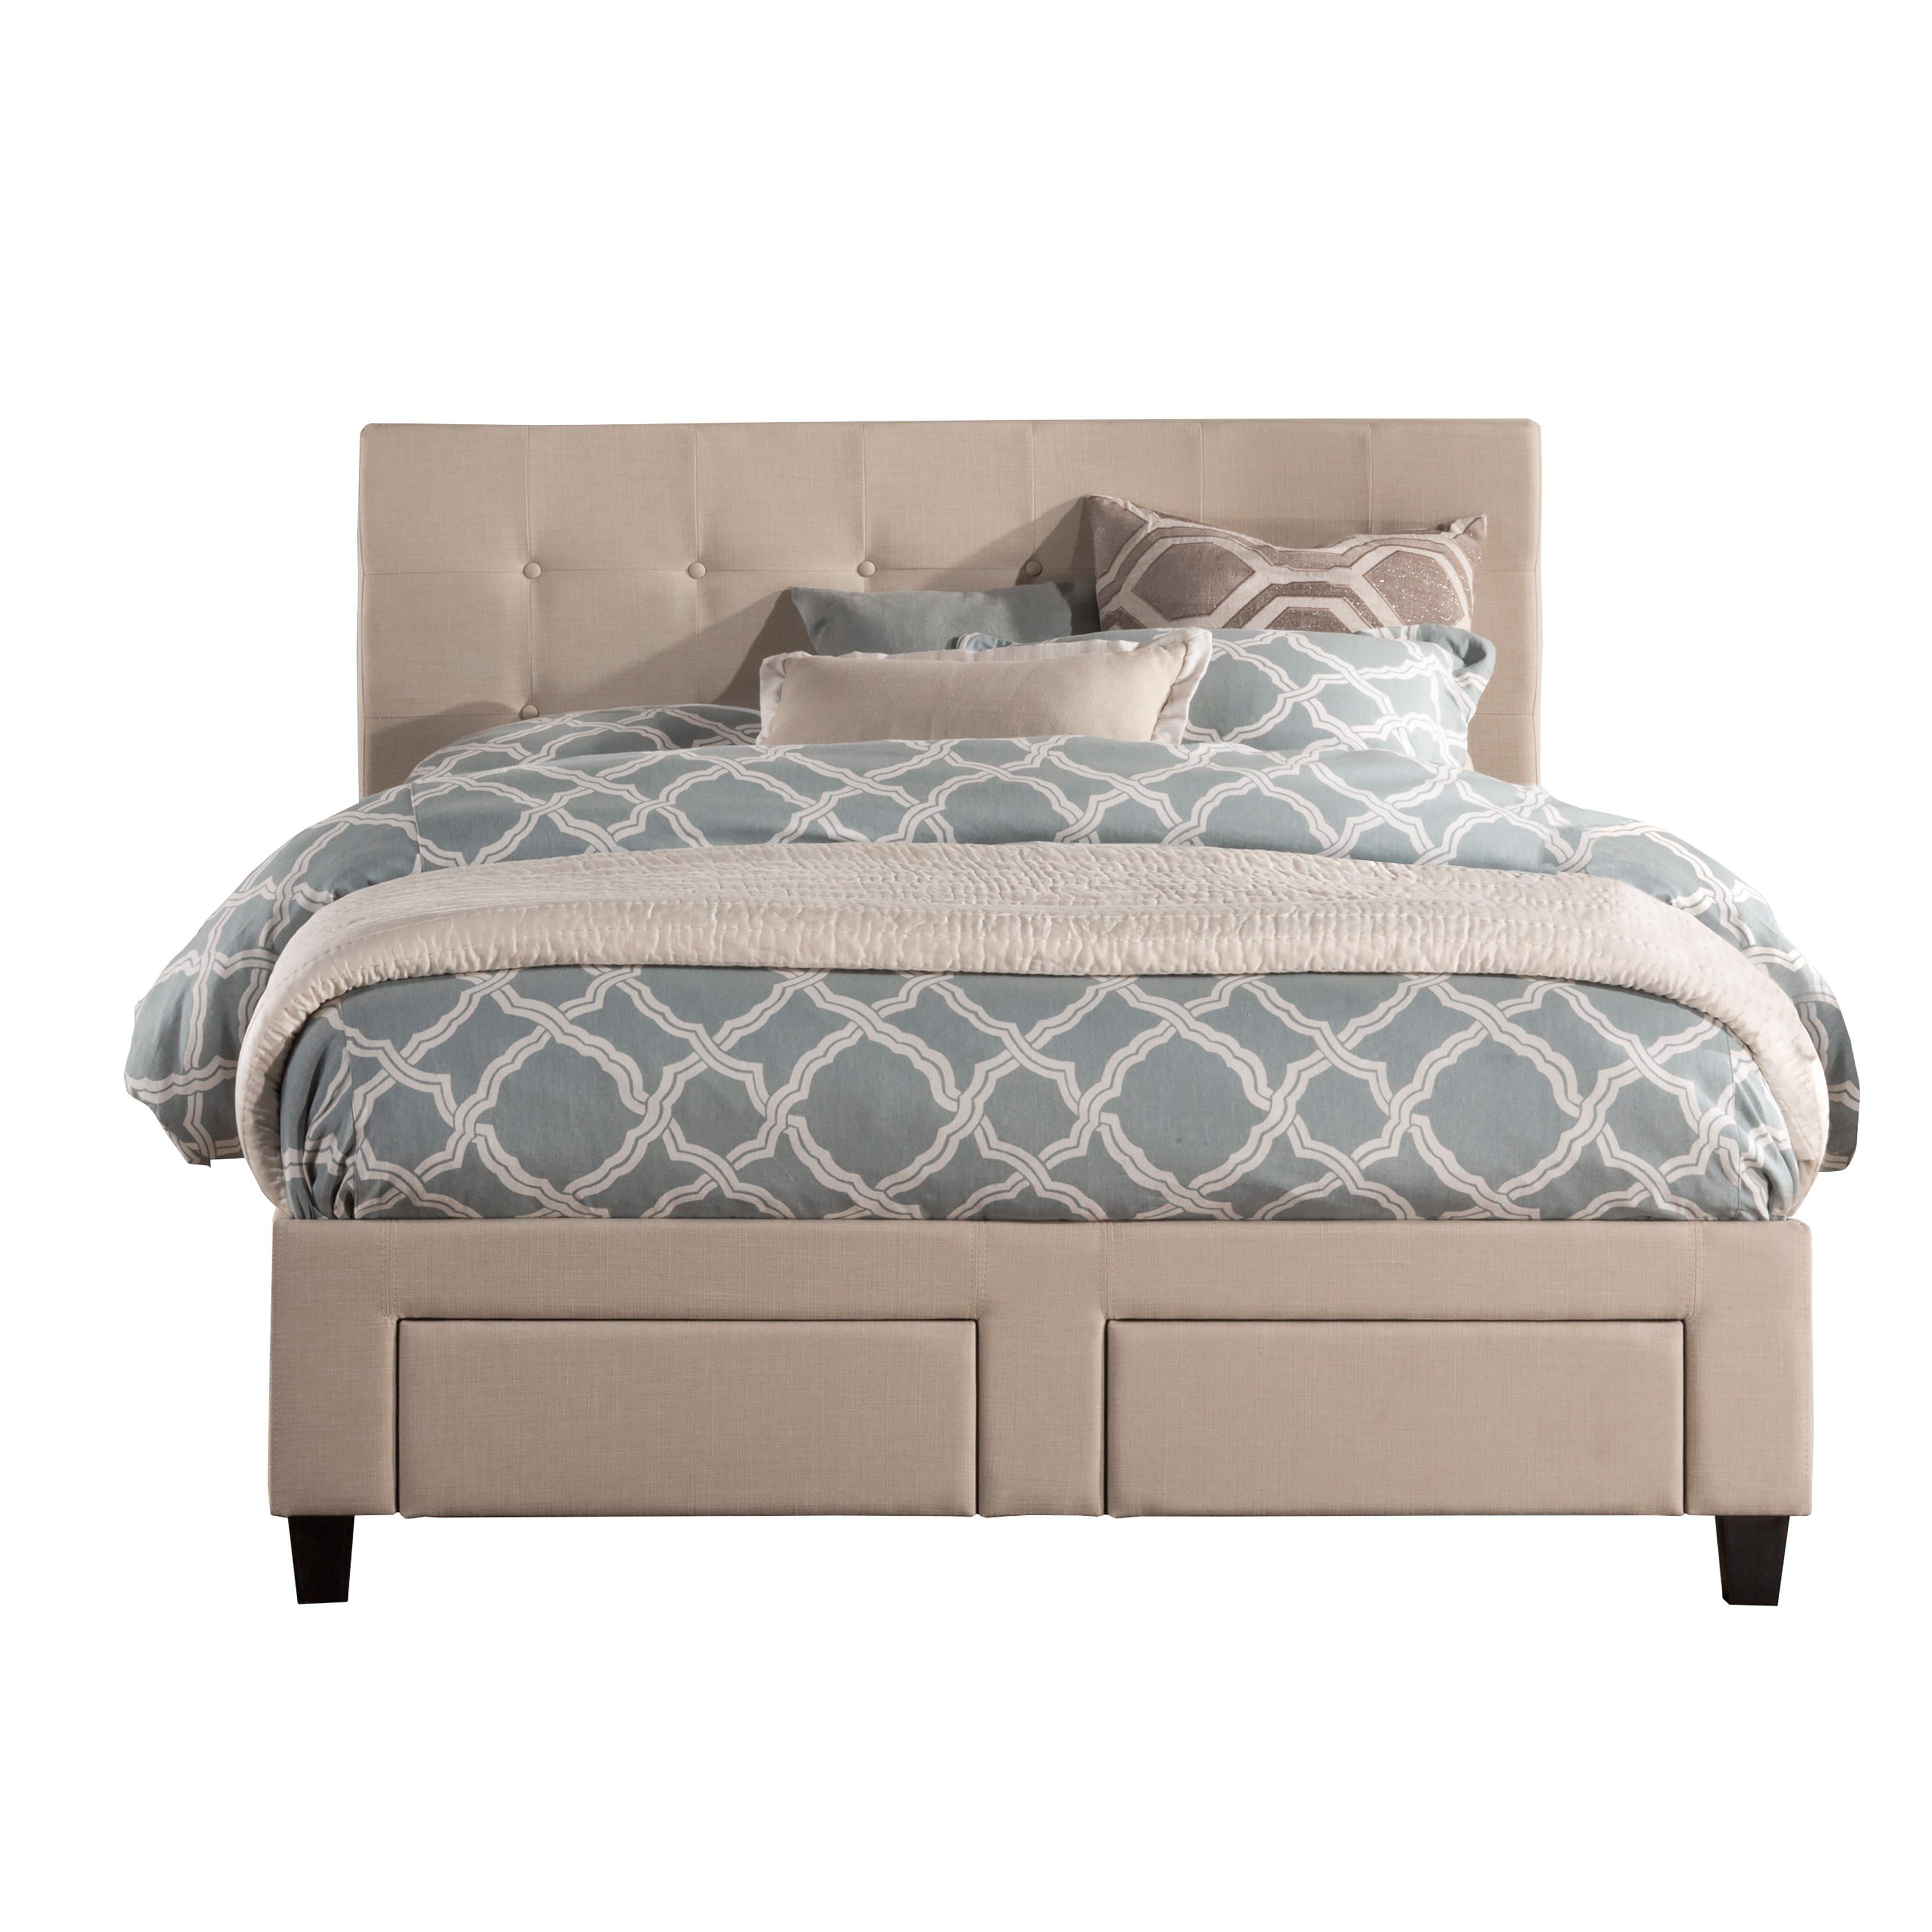 Duggan Beige Upholstered Tufted Front Storage Queen / King Bed frame ...